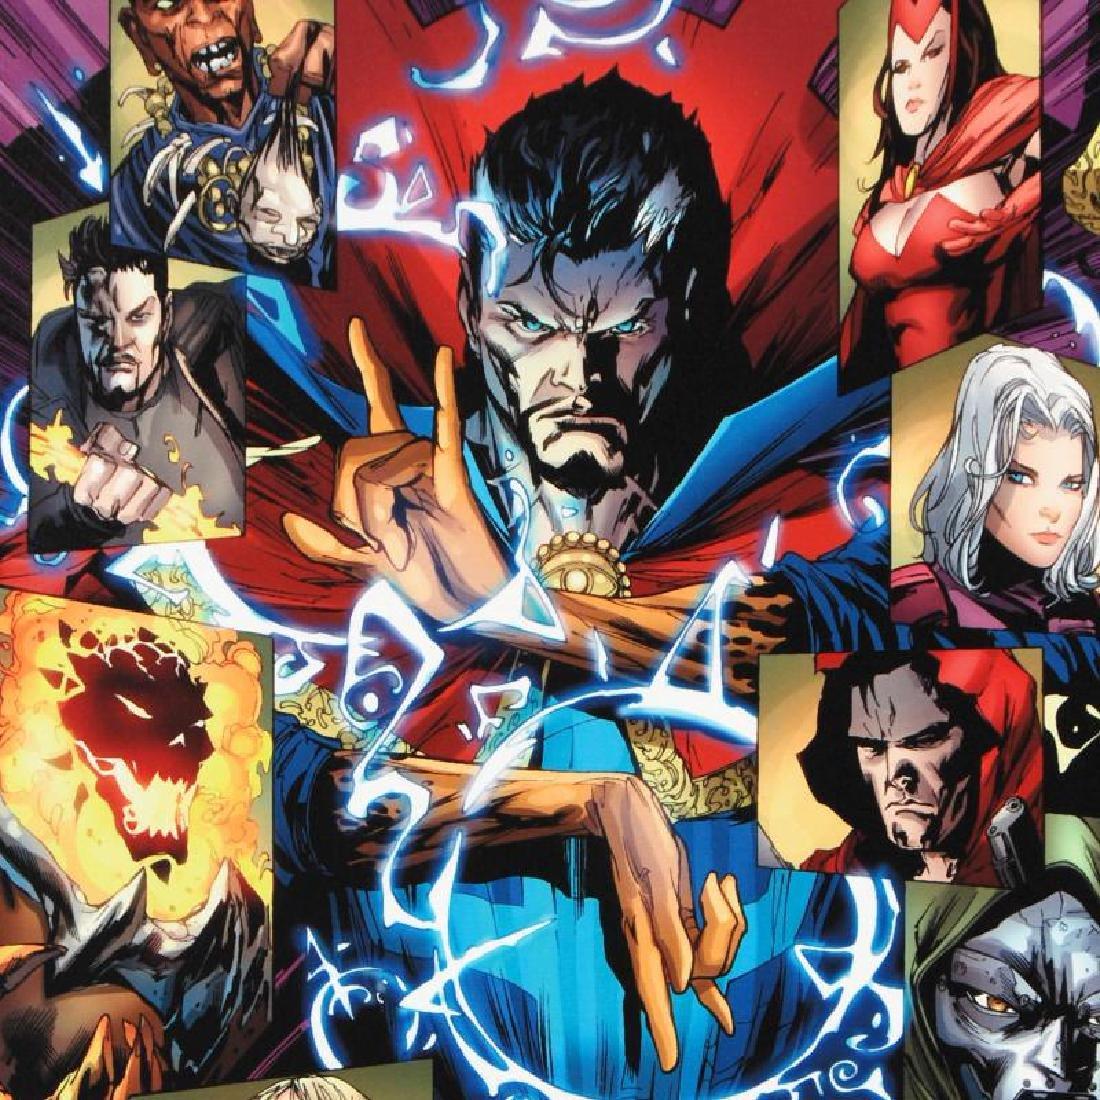 New Avengers #51 by Marvel Comics - 2